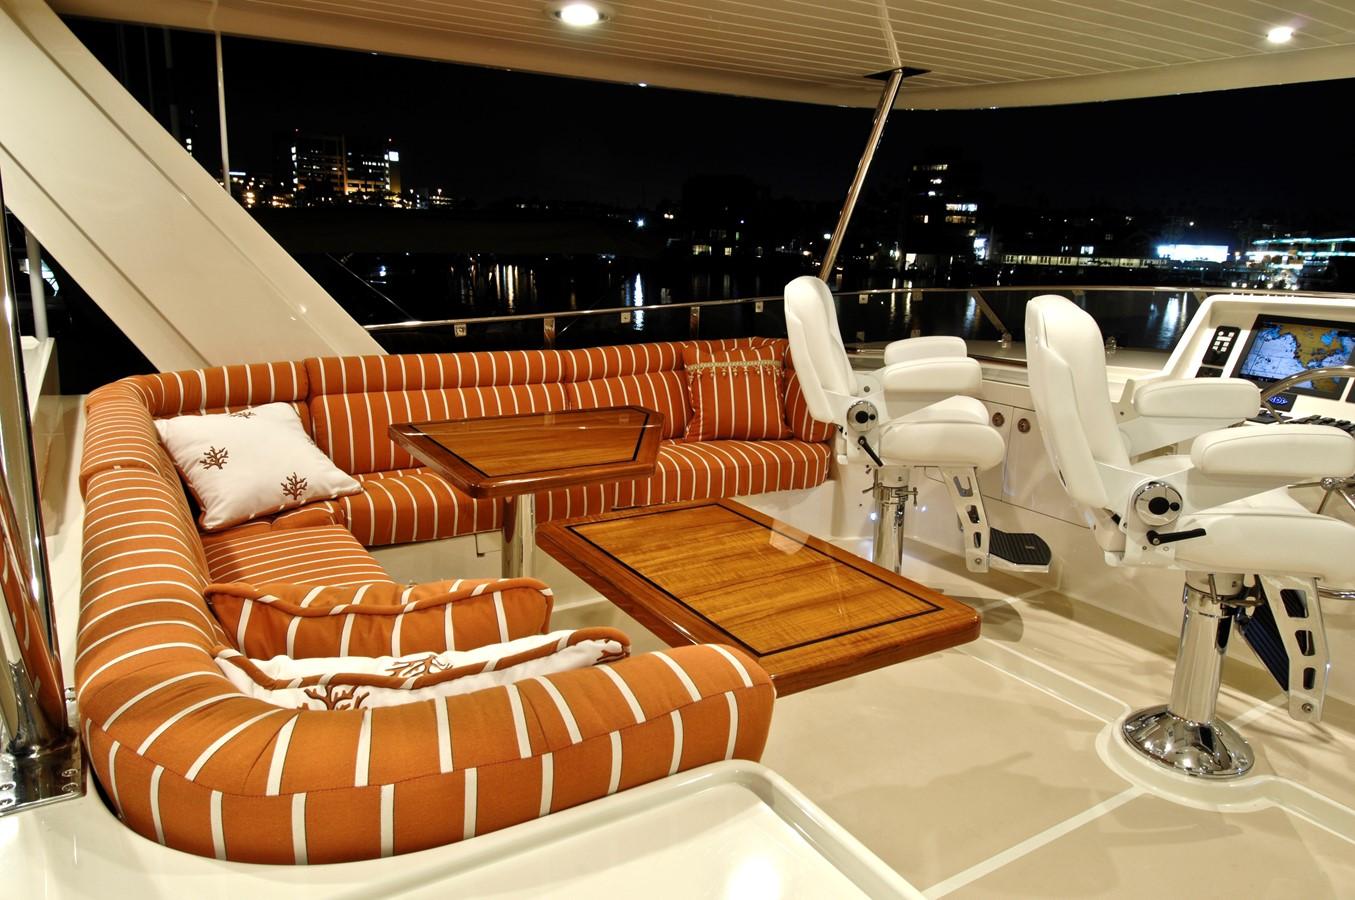 2020 OFFSHORE YACHTS 76/80 Motoryacht Motor Yacht 1959690